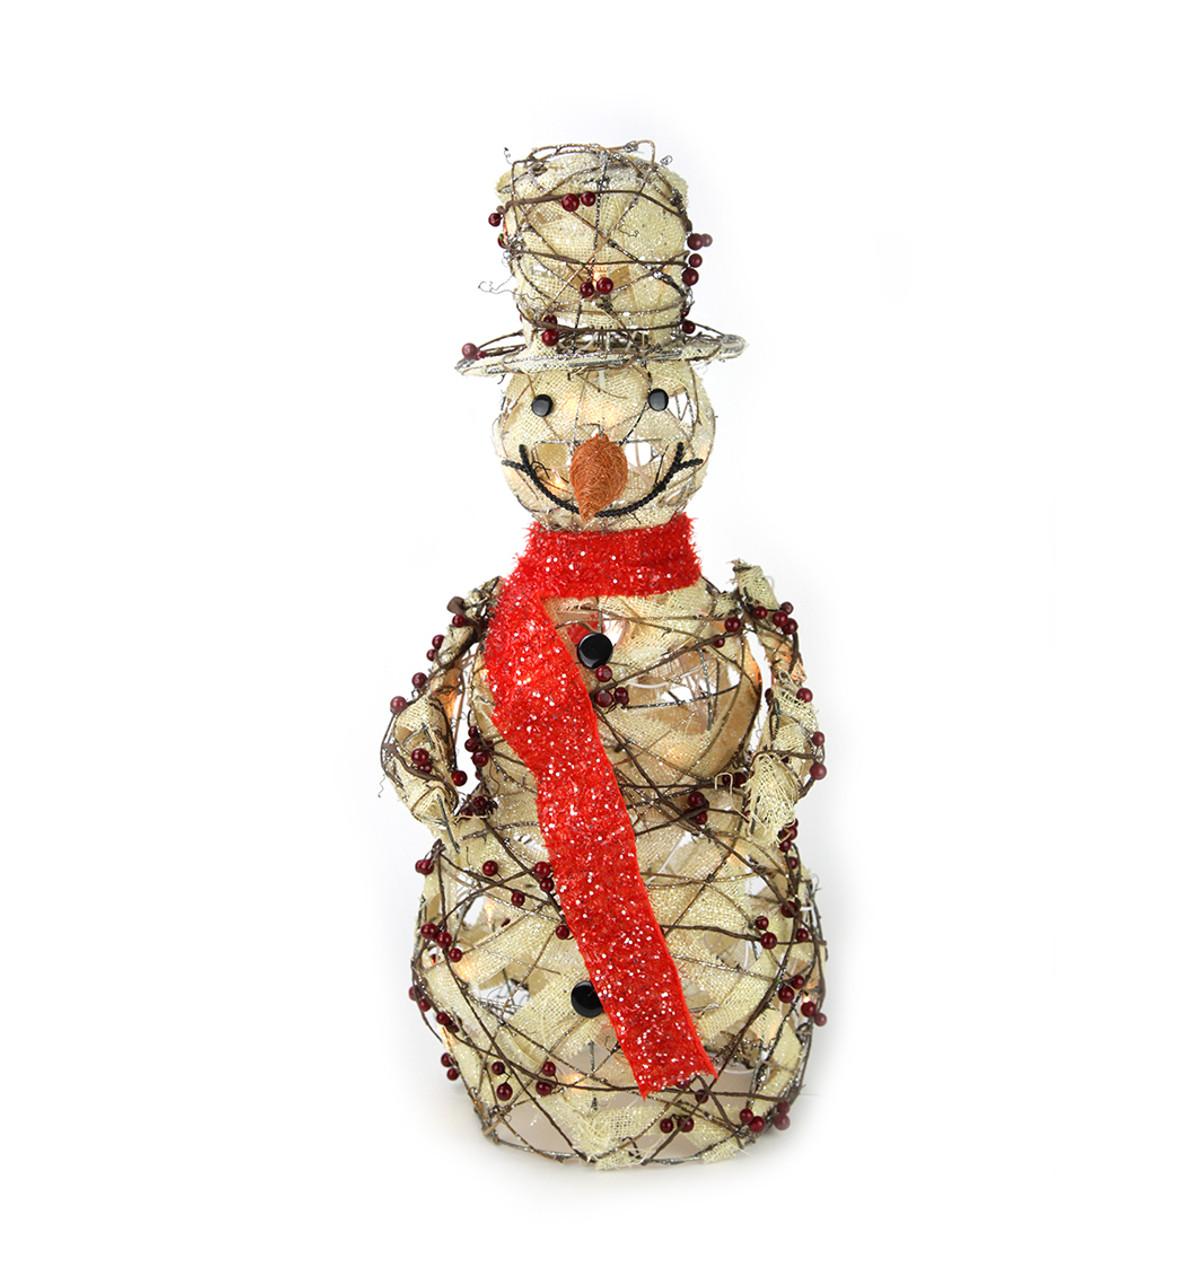 "Lighted Burlap Christmas Decorations: 27.5"" Lighted Burlap & Berry Rattan Standing Snowman"